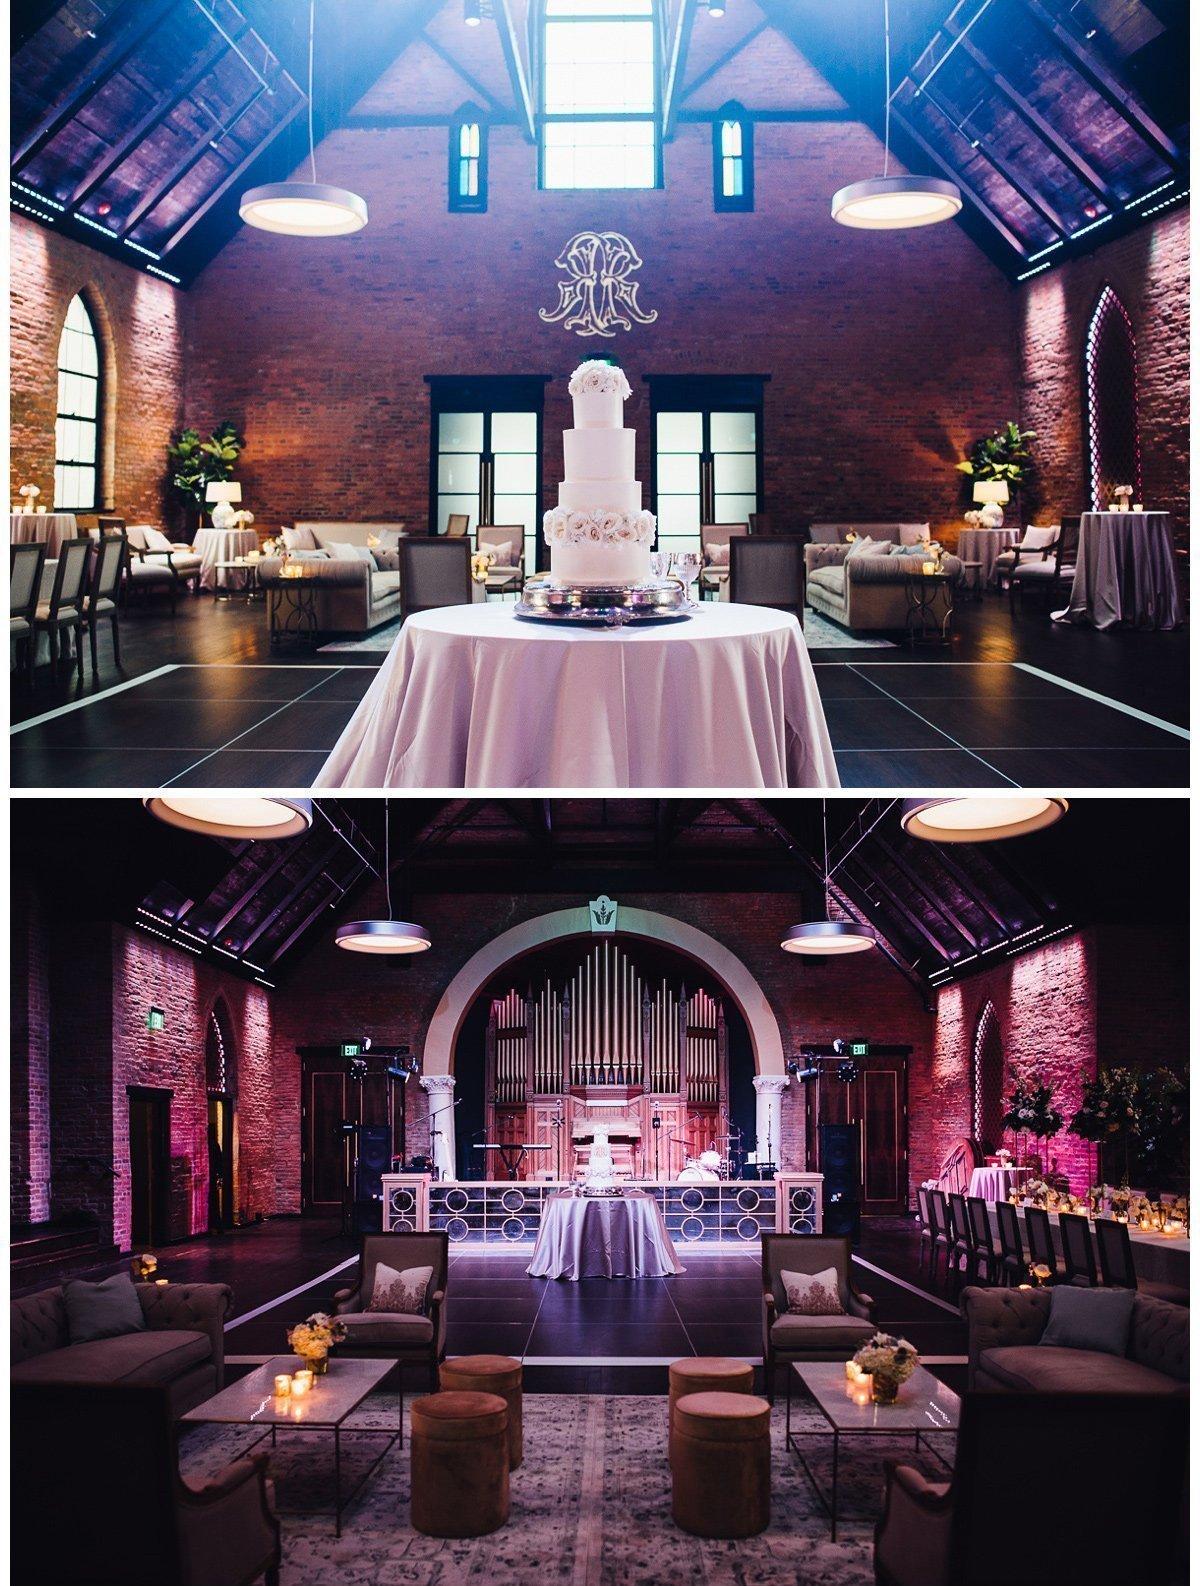 clementine-hall-wedding-reception-3 Clementine Hall   Nashville Wedding   Rachel and Bobby